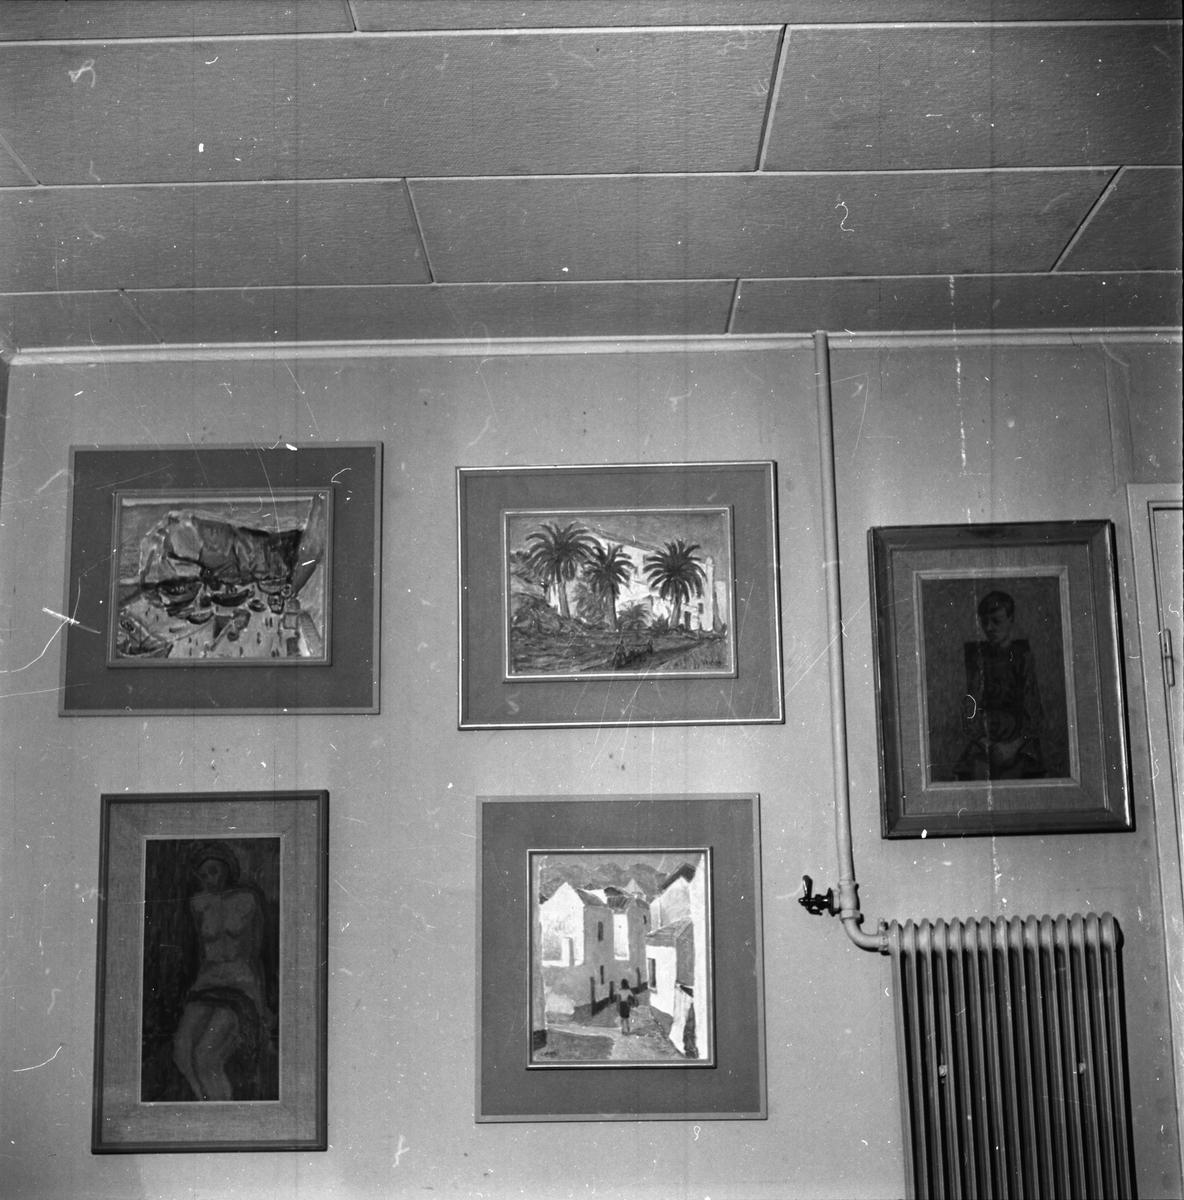 Clahr Emil,Konstnär Edsbyn 3 jan 1960